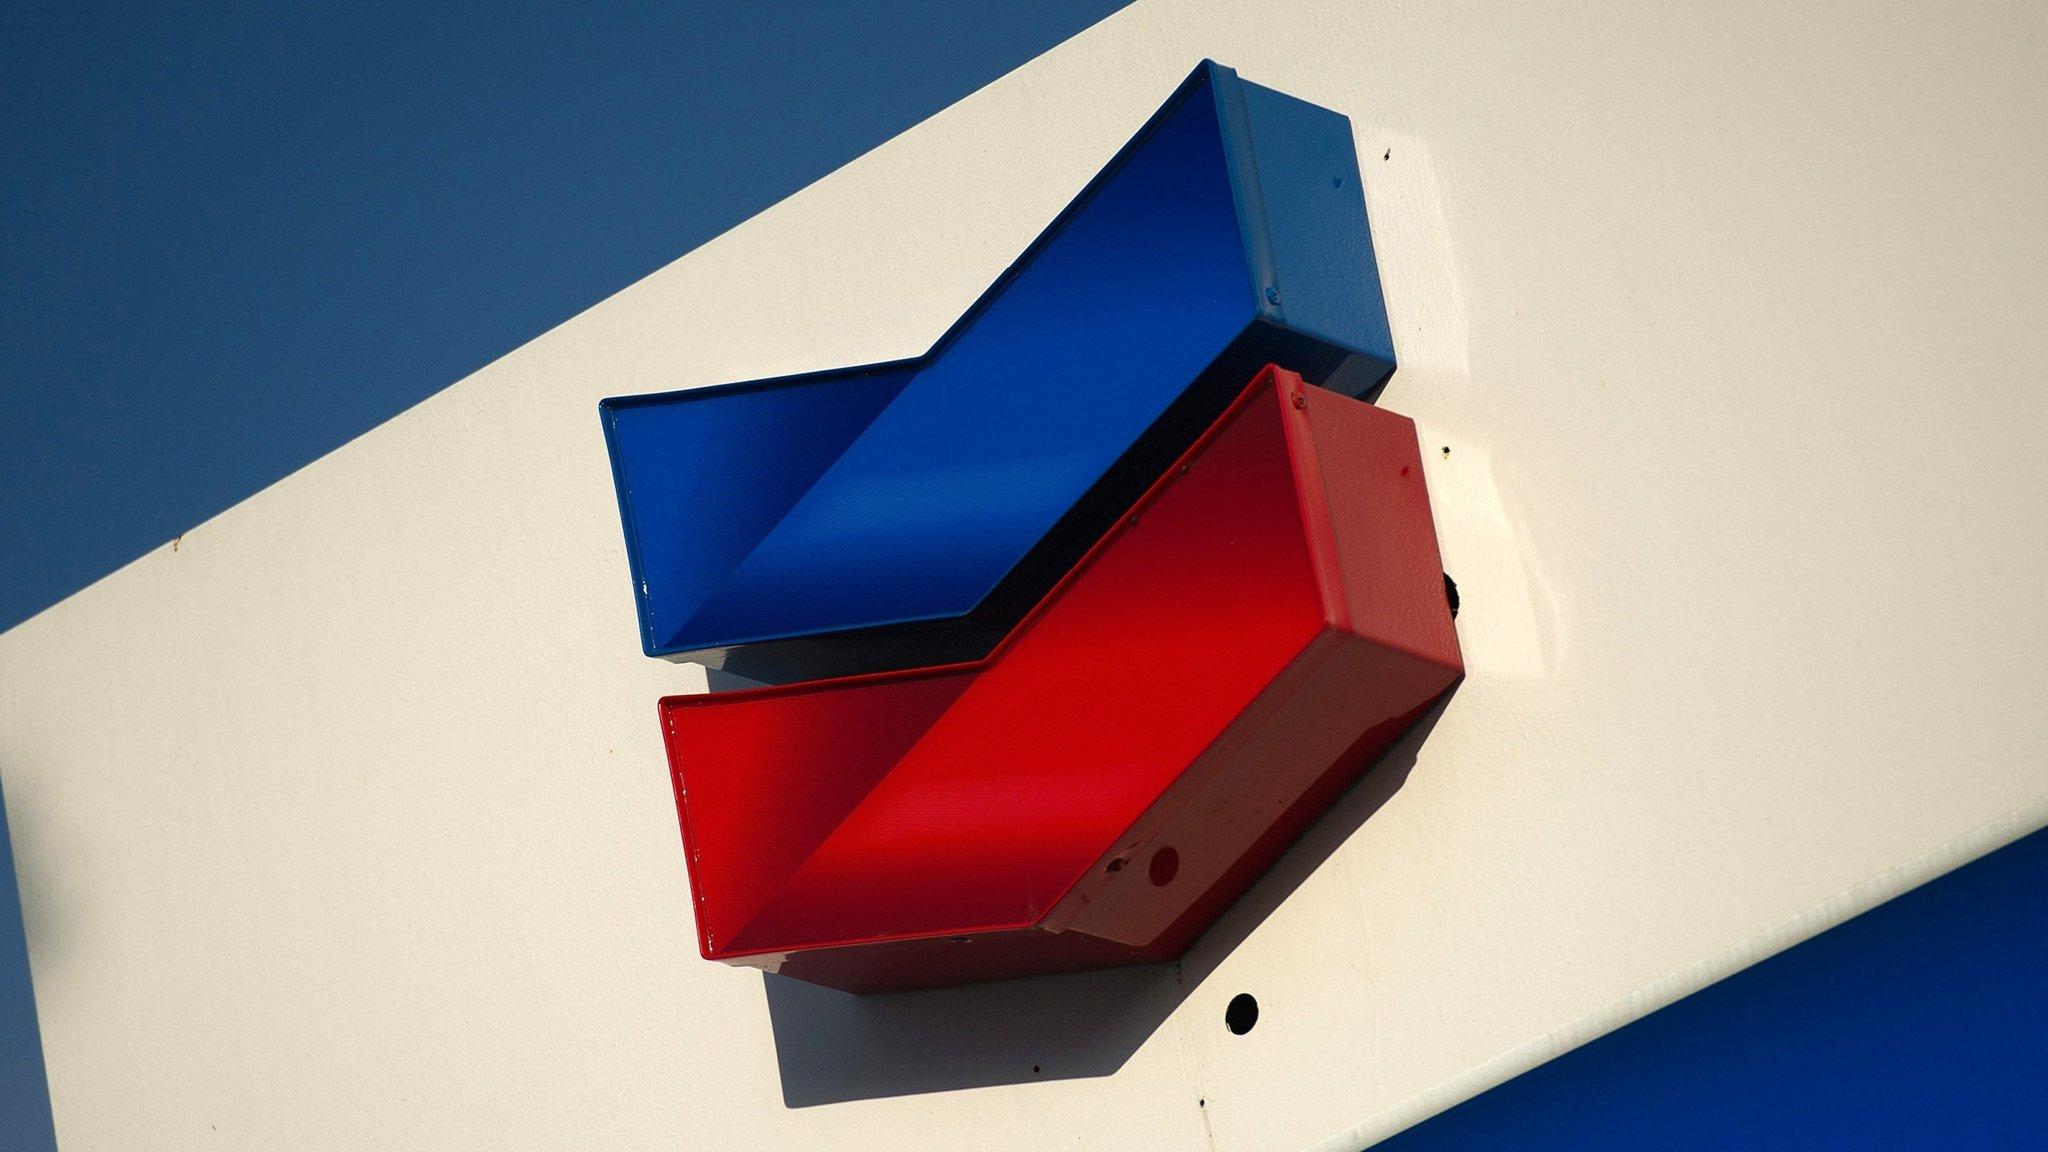 Chevron approves $37bn Kazakhstan oilfield expansion